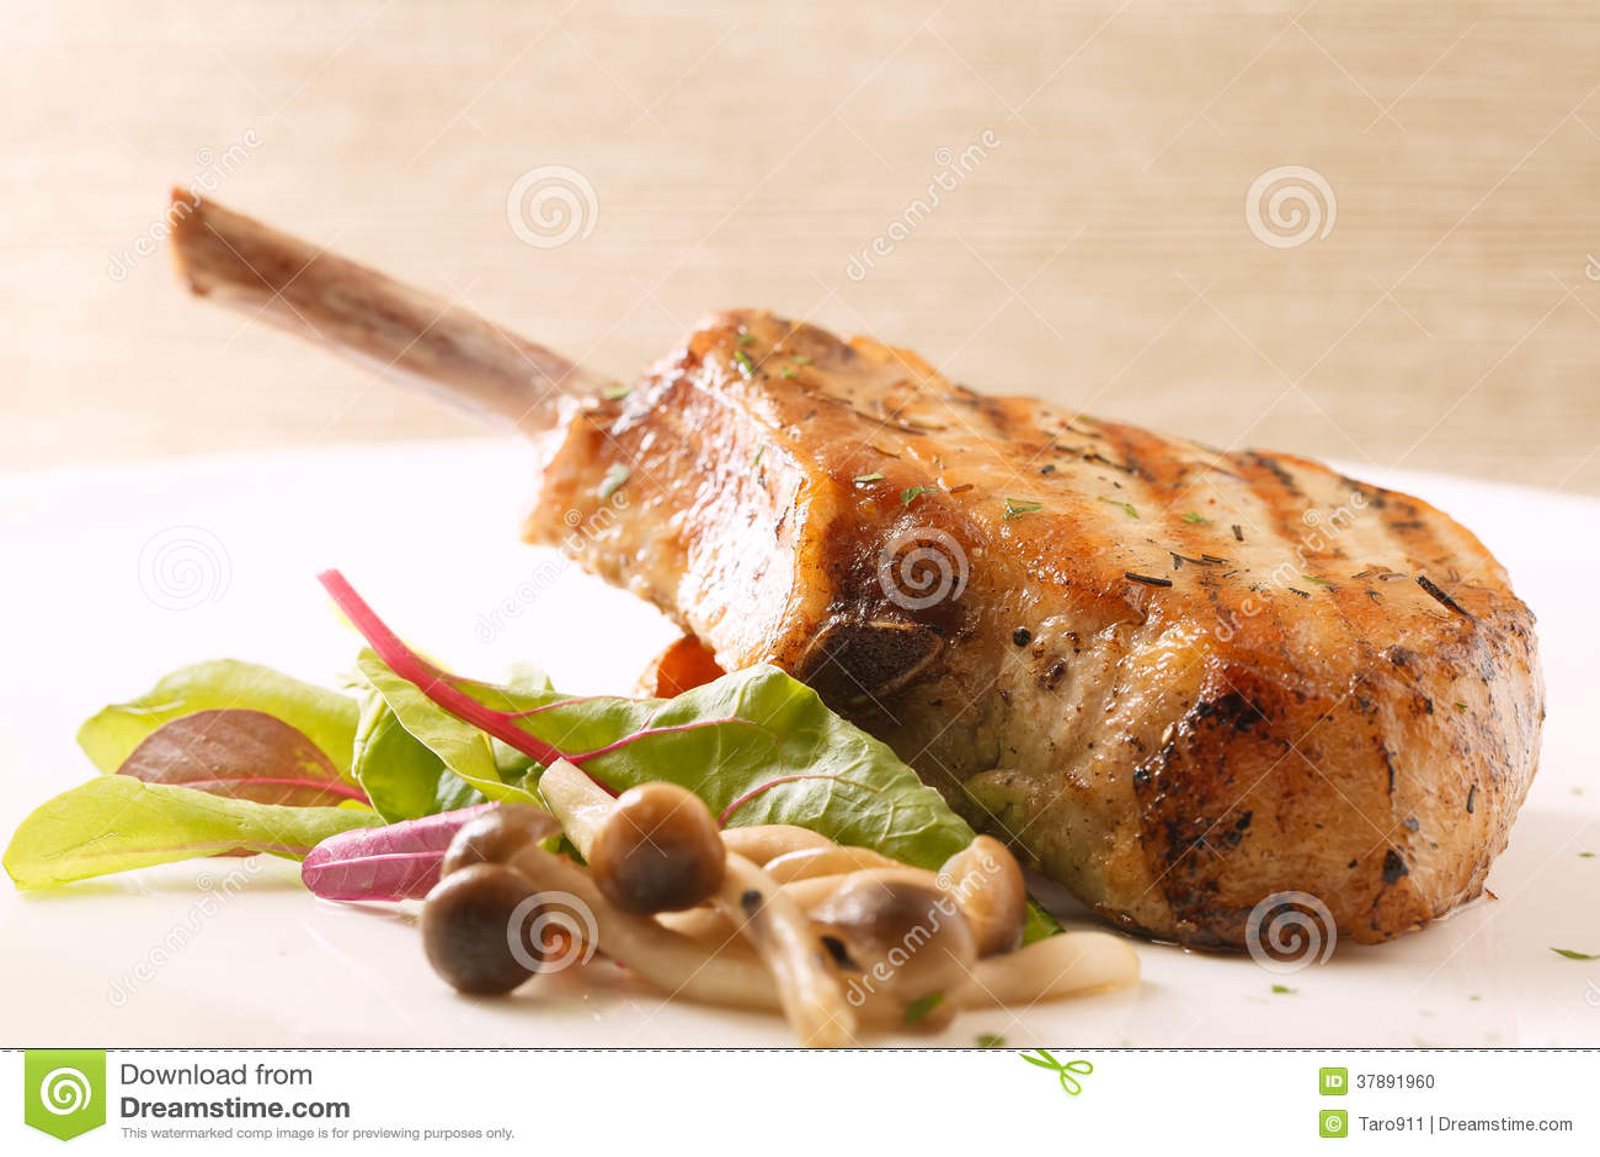 Het lapje vlees van de varkensvleesrib